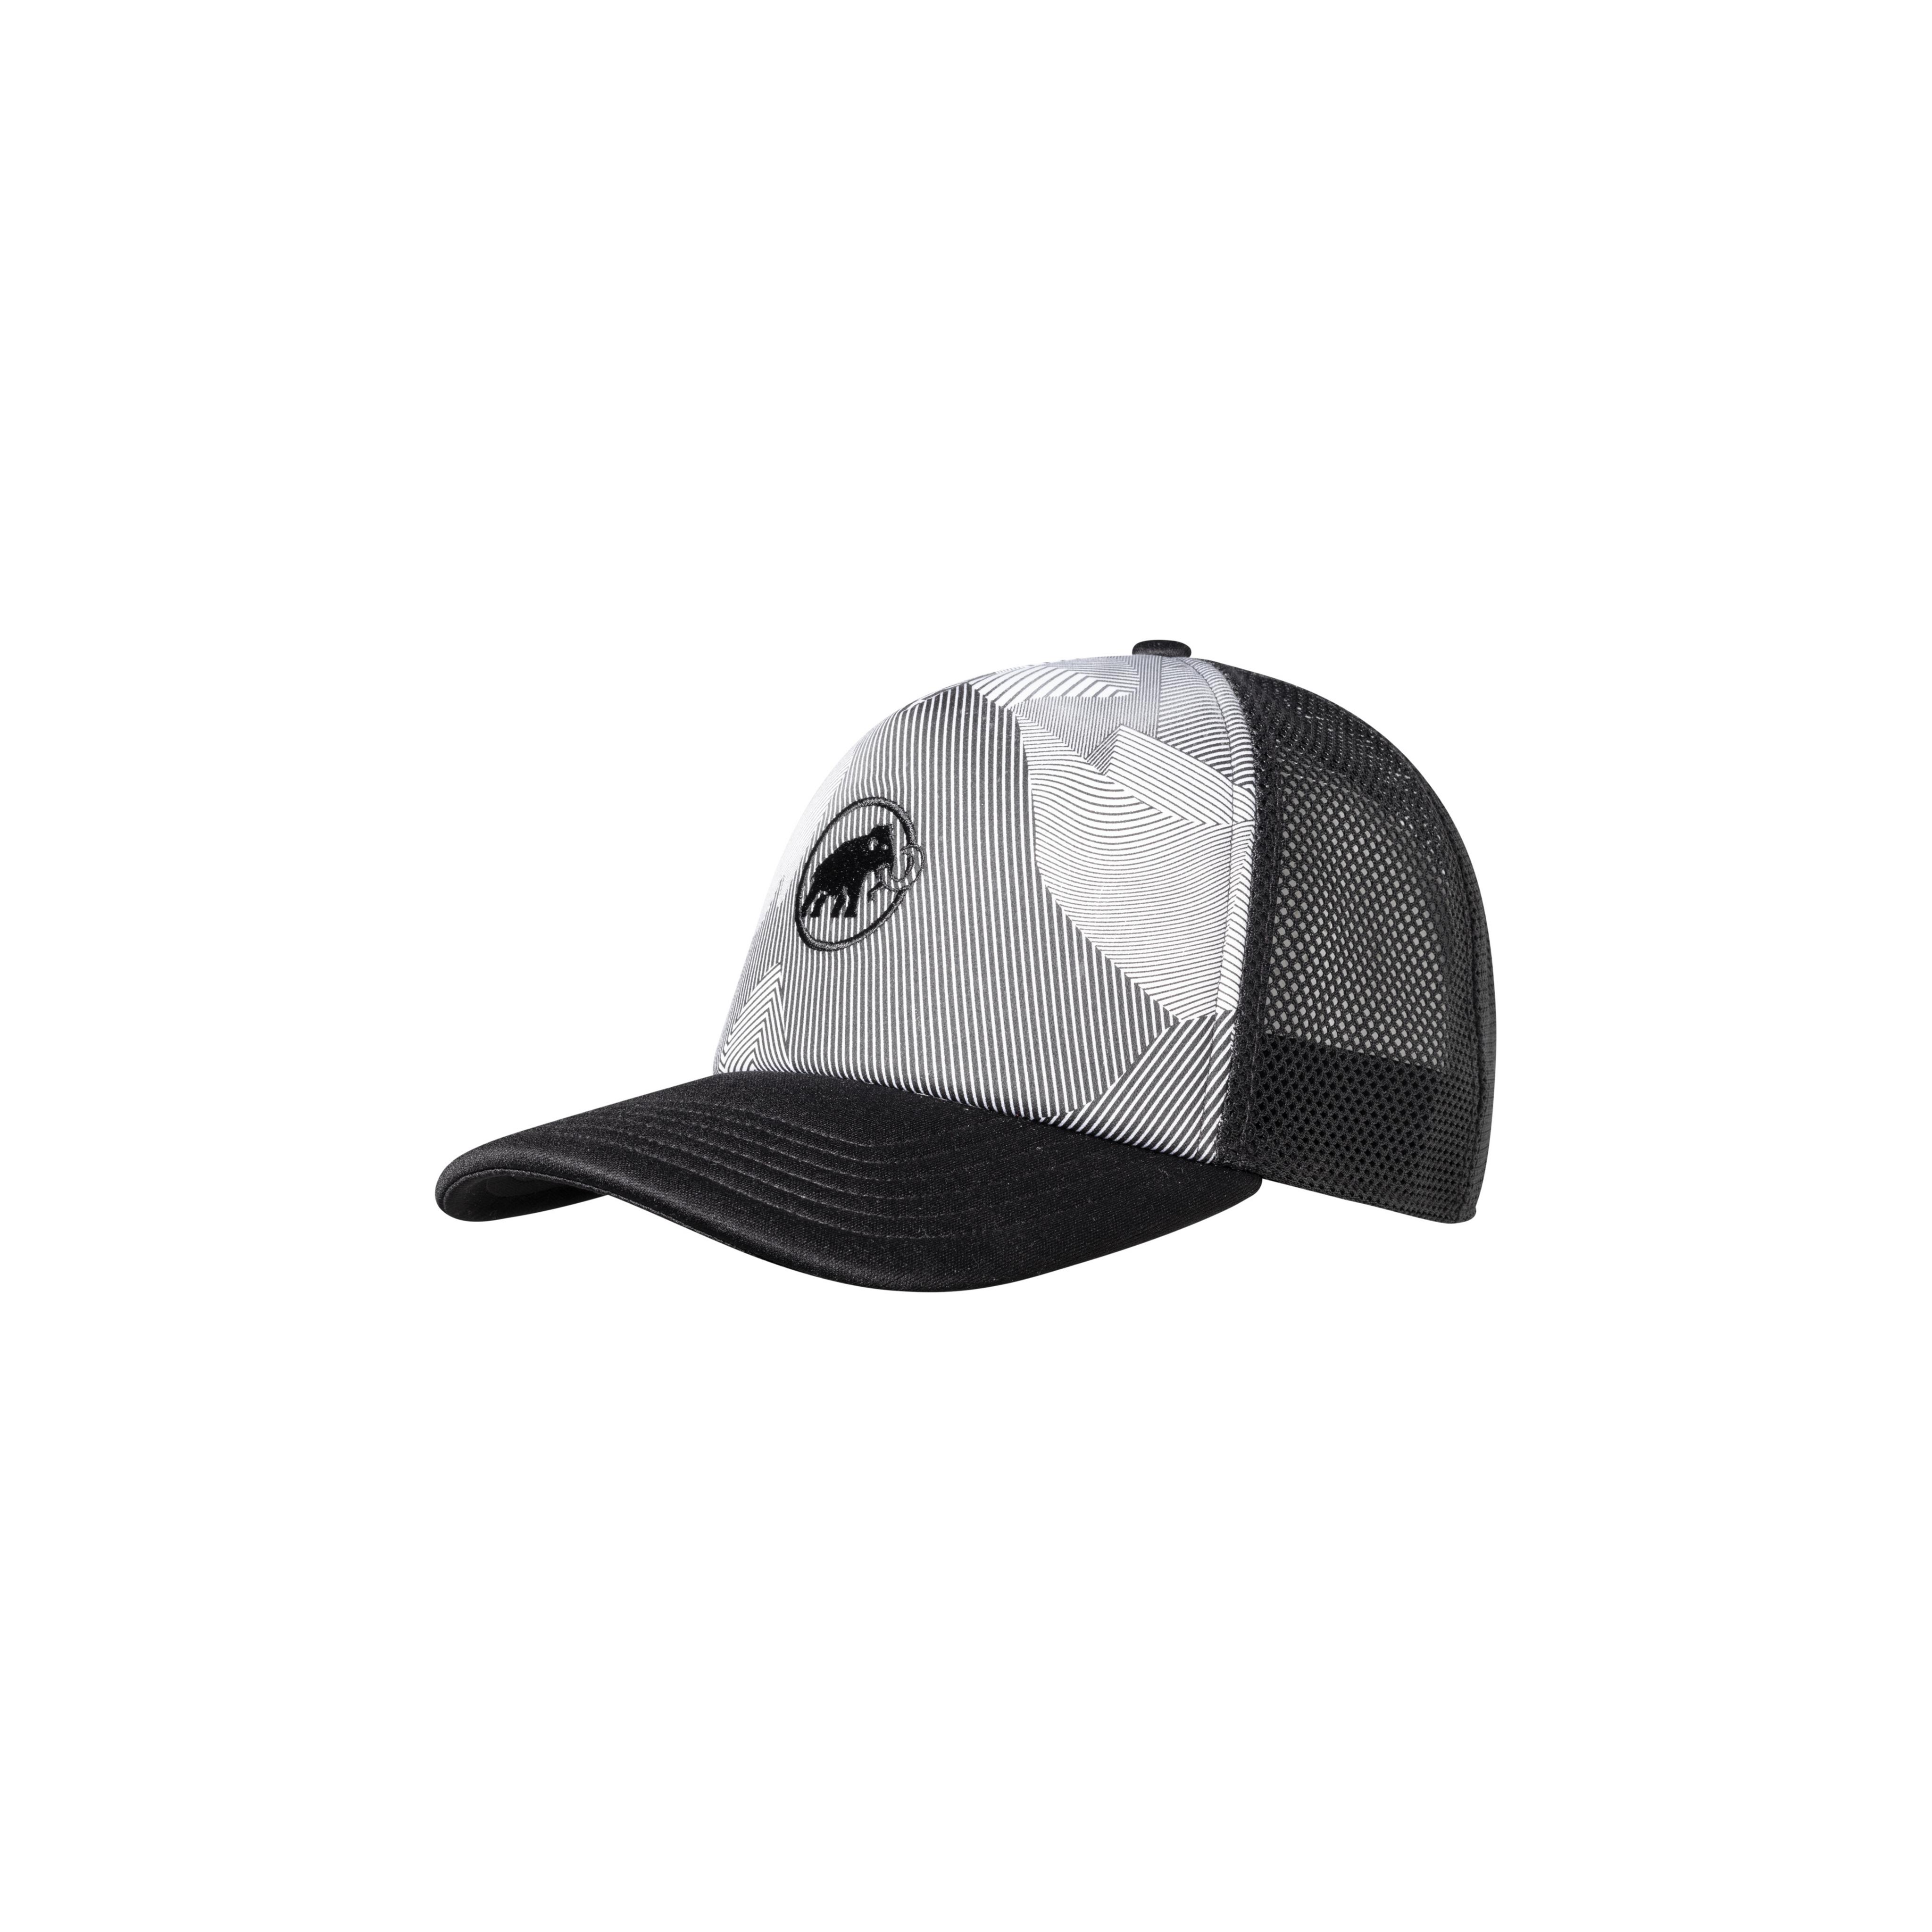 Crag Cap - black-white, S-M thumbnail